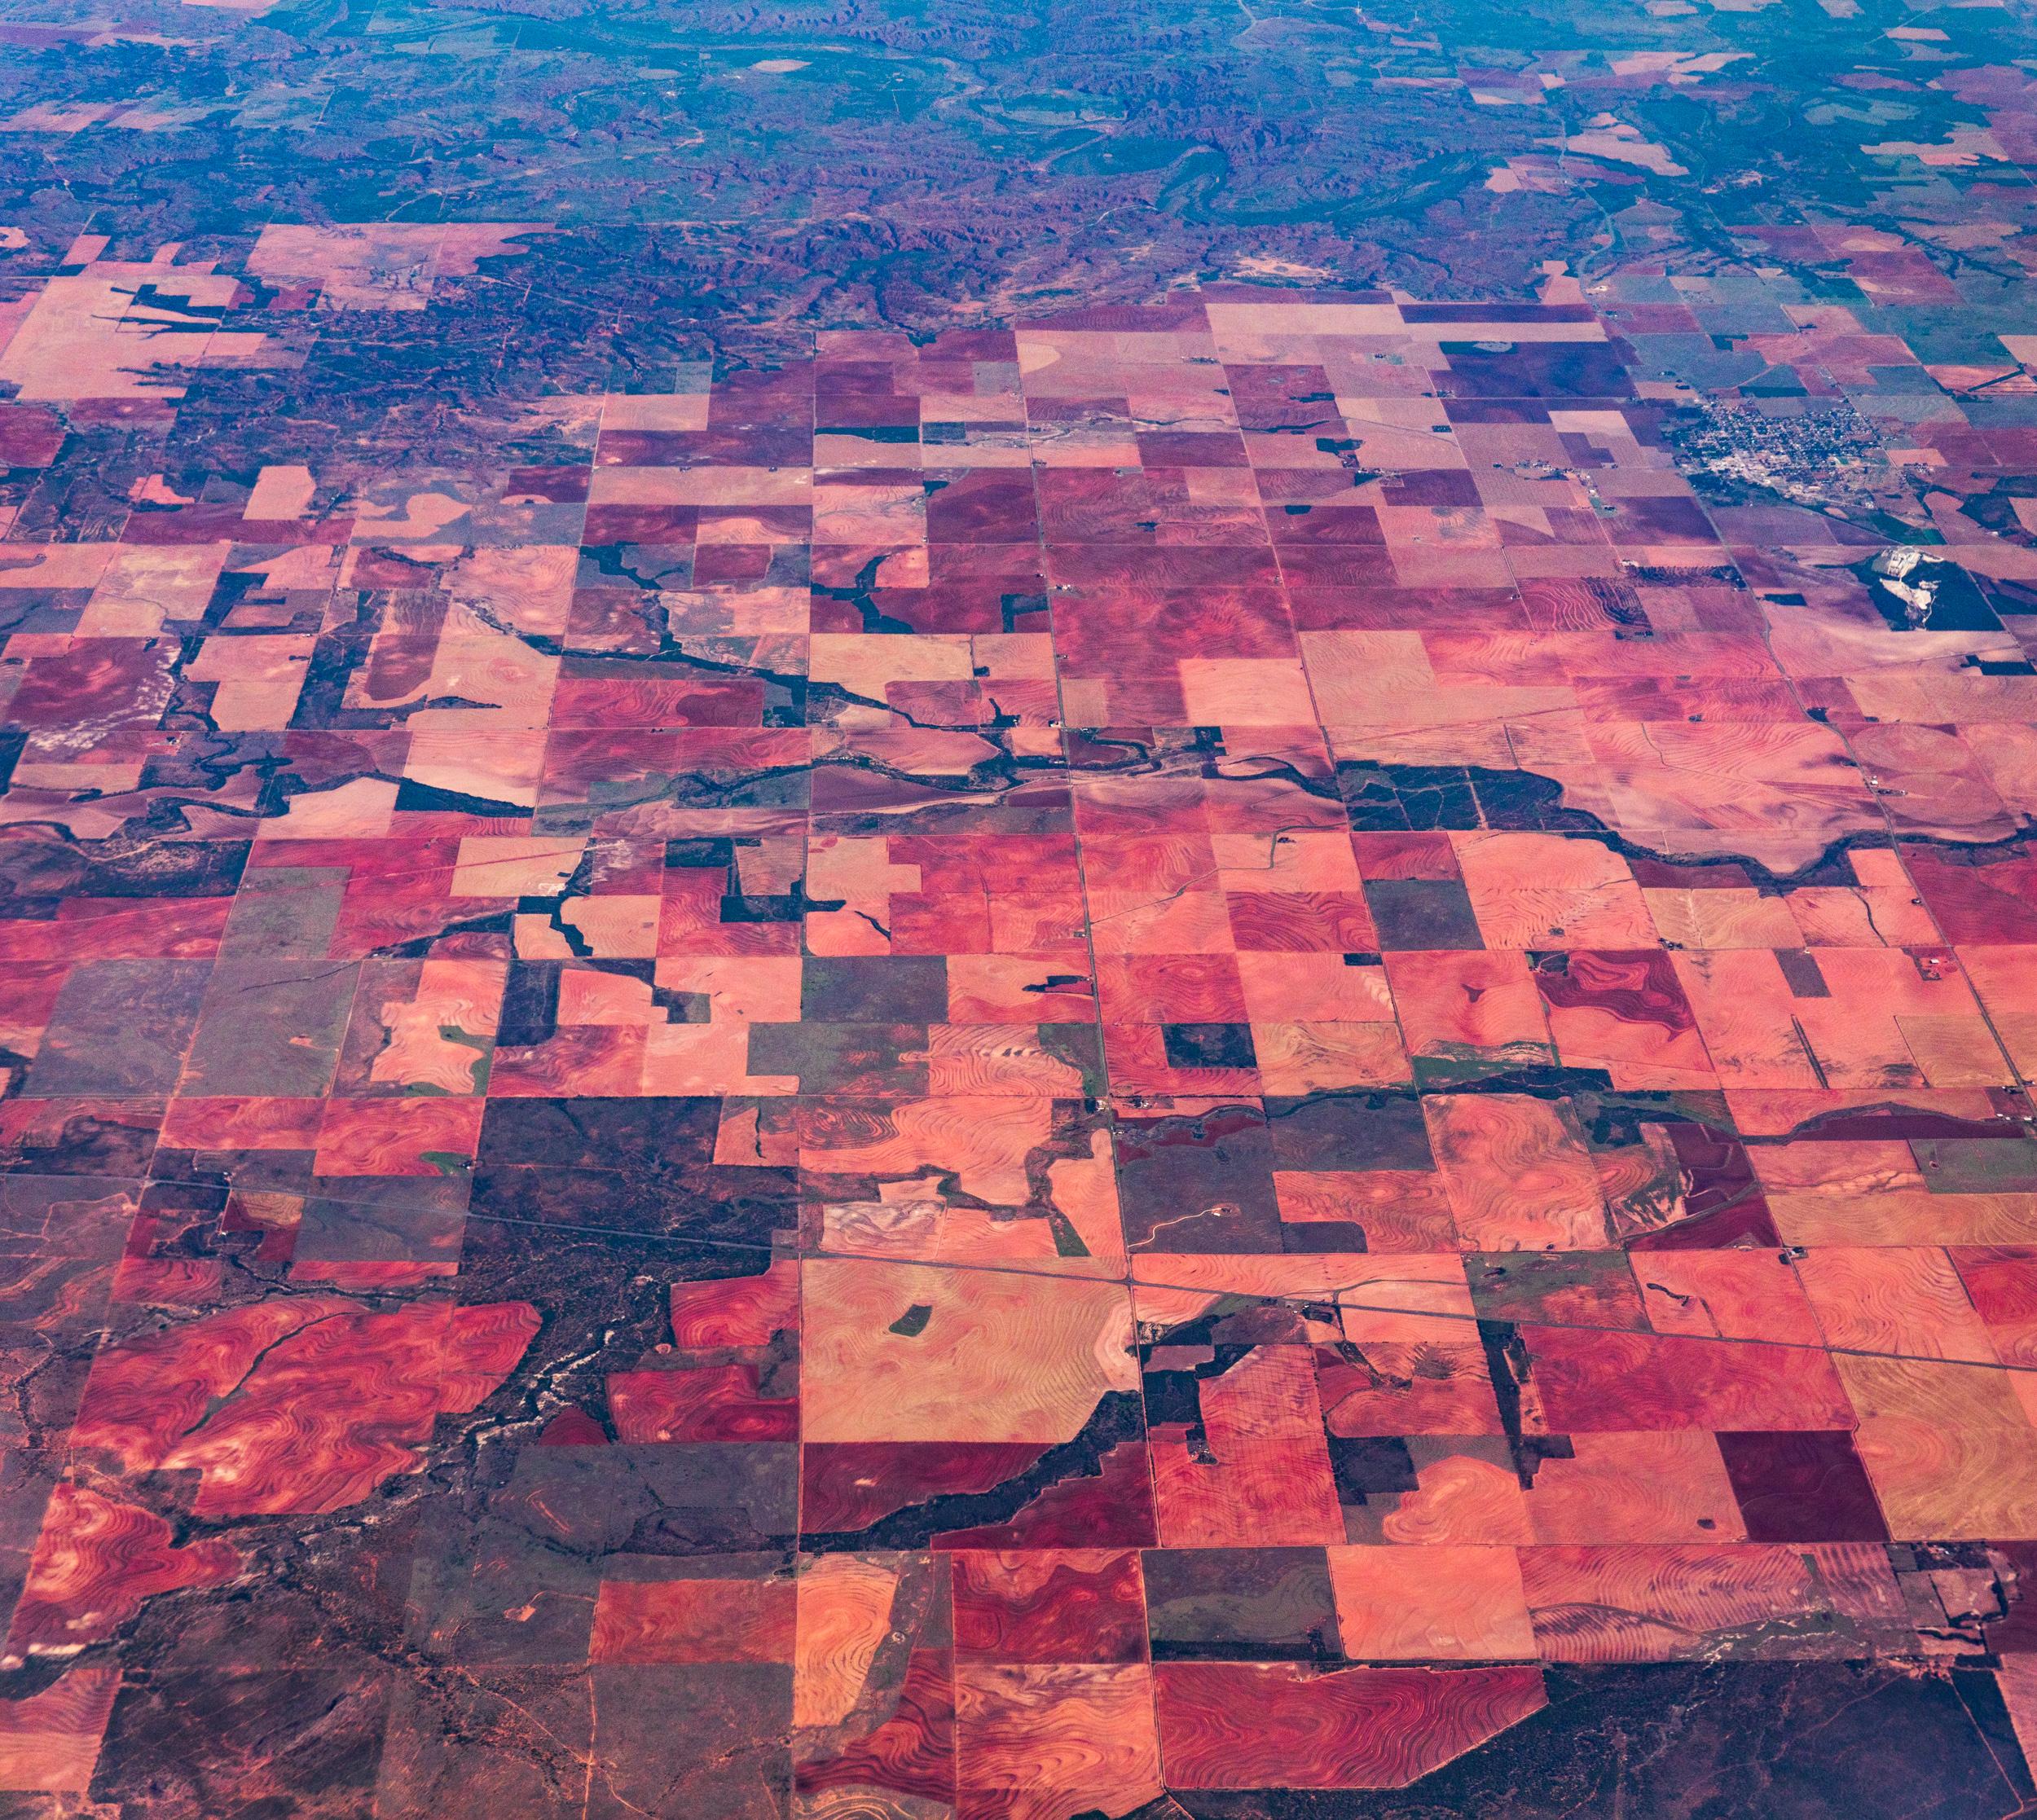 Aerials for Bannon 2019 (2.5k)-22.jpg